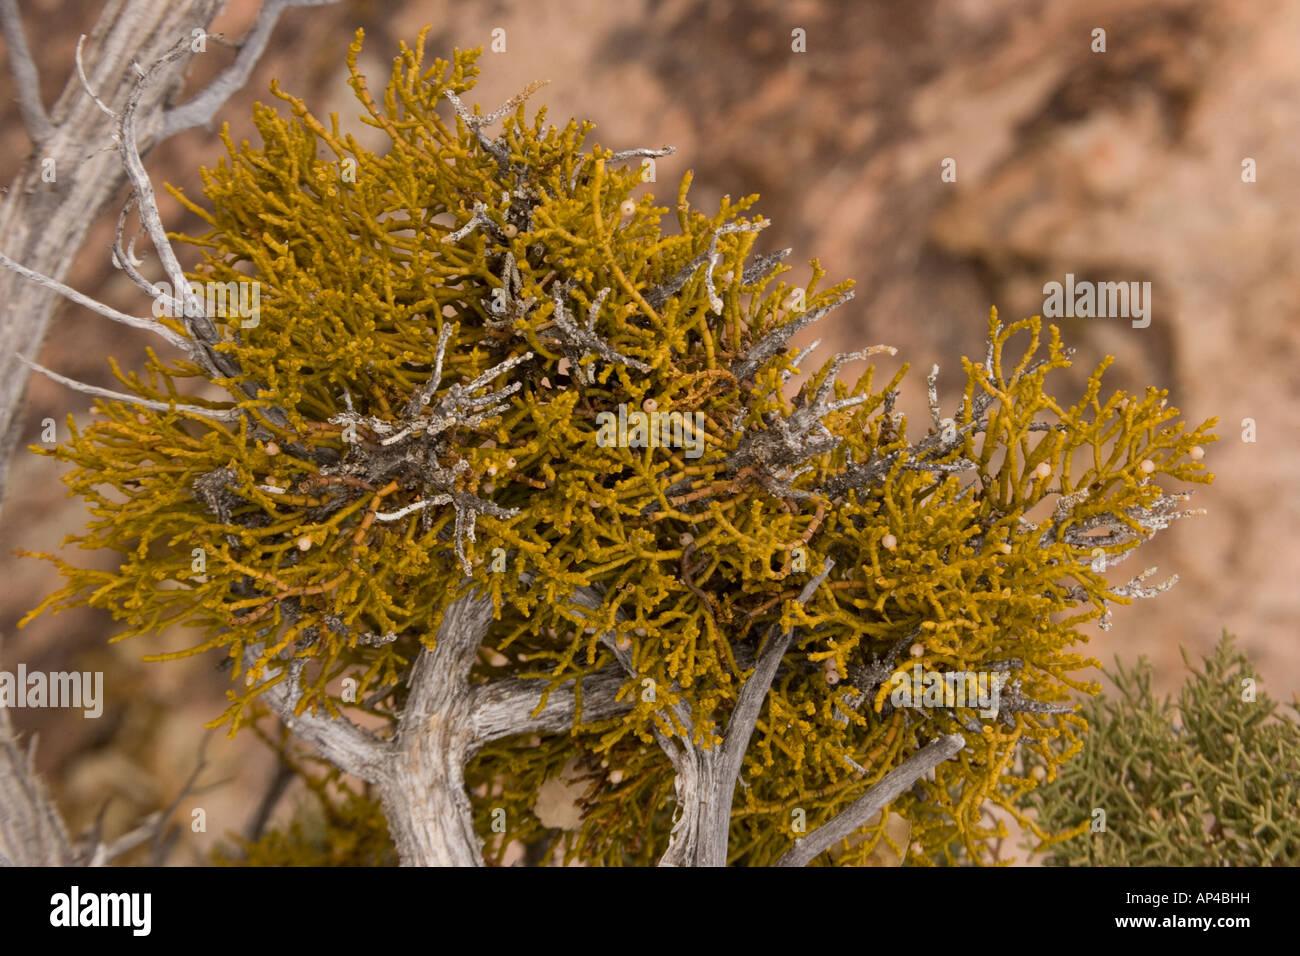 Juniper dwarf mistletoe Arceuthobium divaricatum parasitic on juniper Utah USA - Stock Image